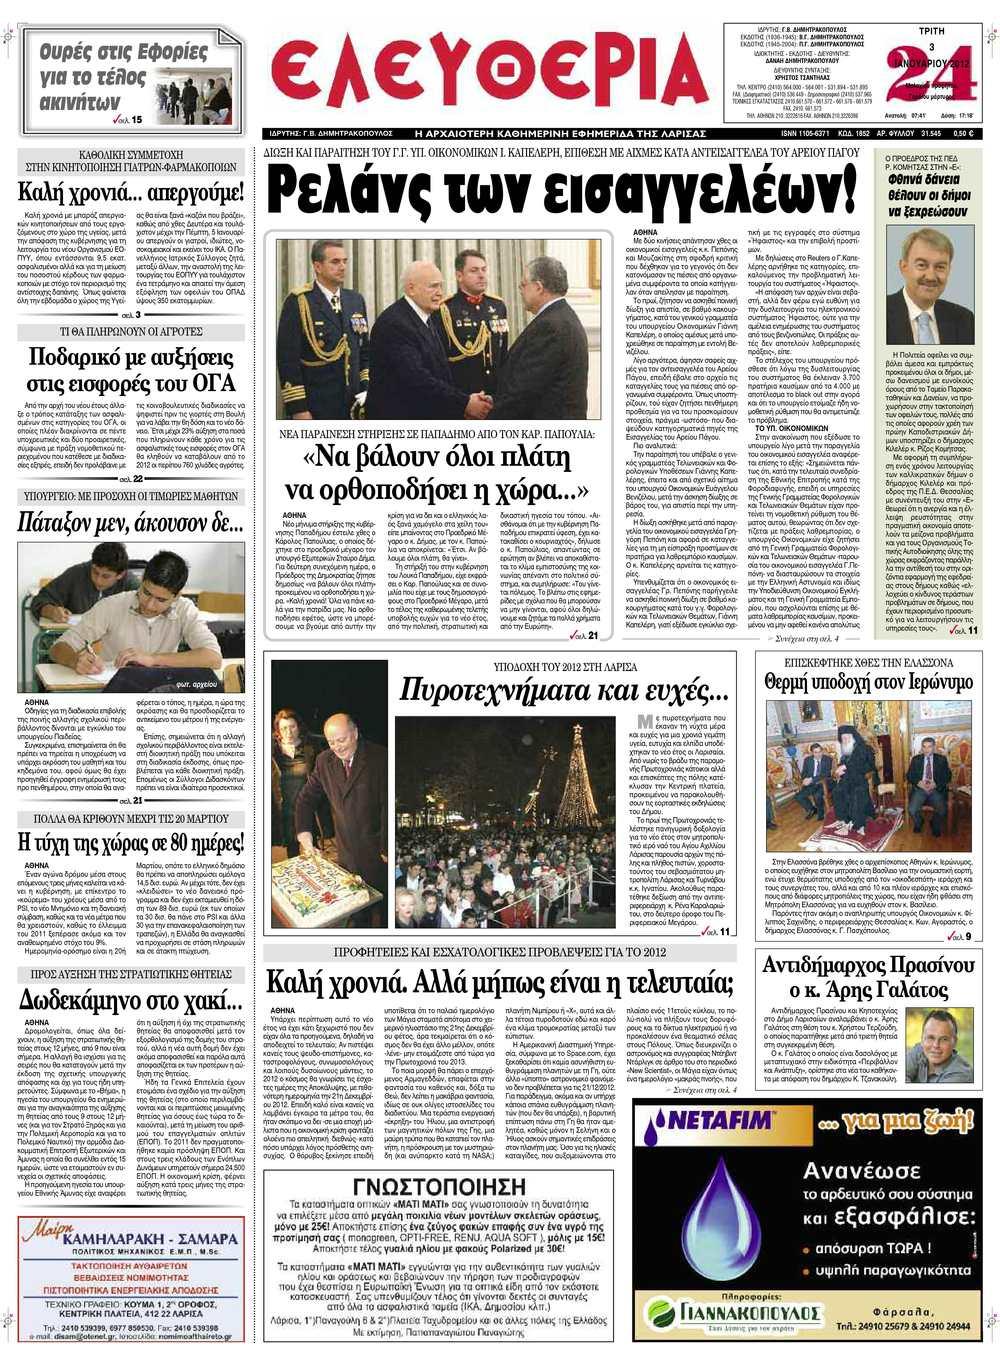 Calaméo - Eleftheria.gr 03 01 2012 f1c6e40fbb4